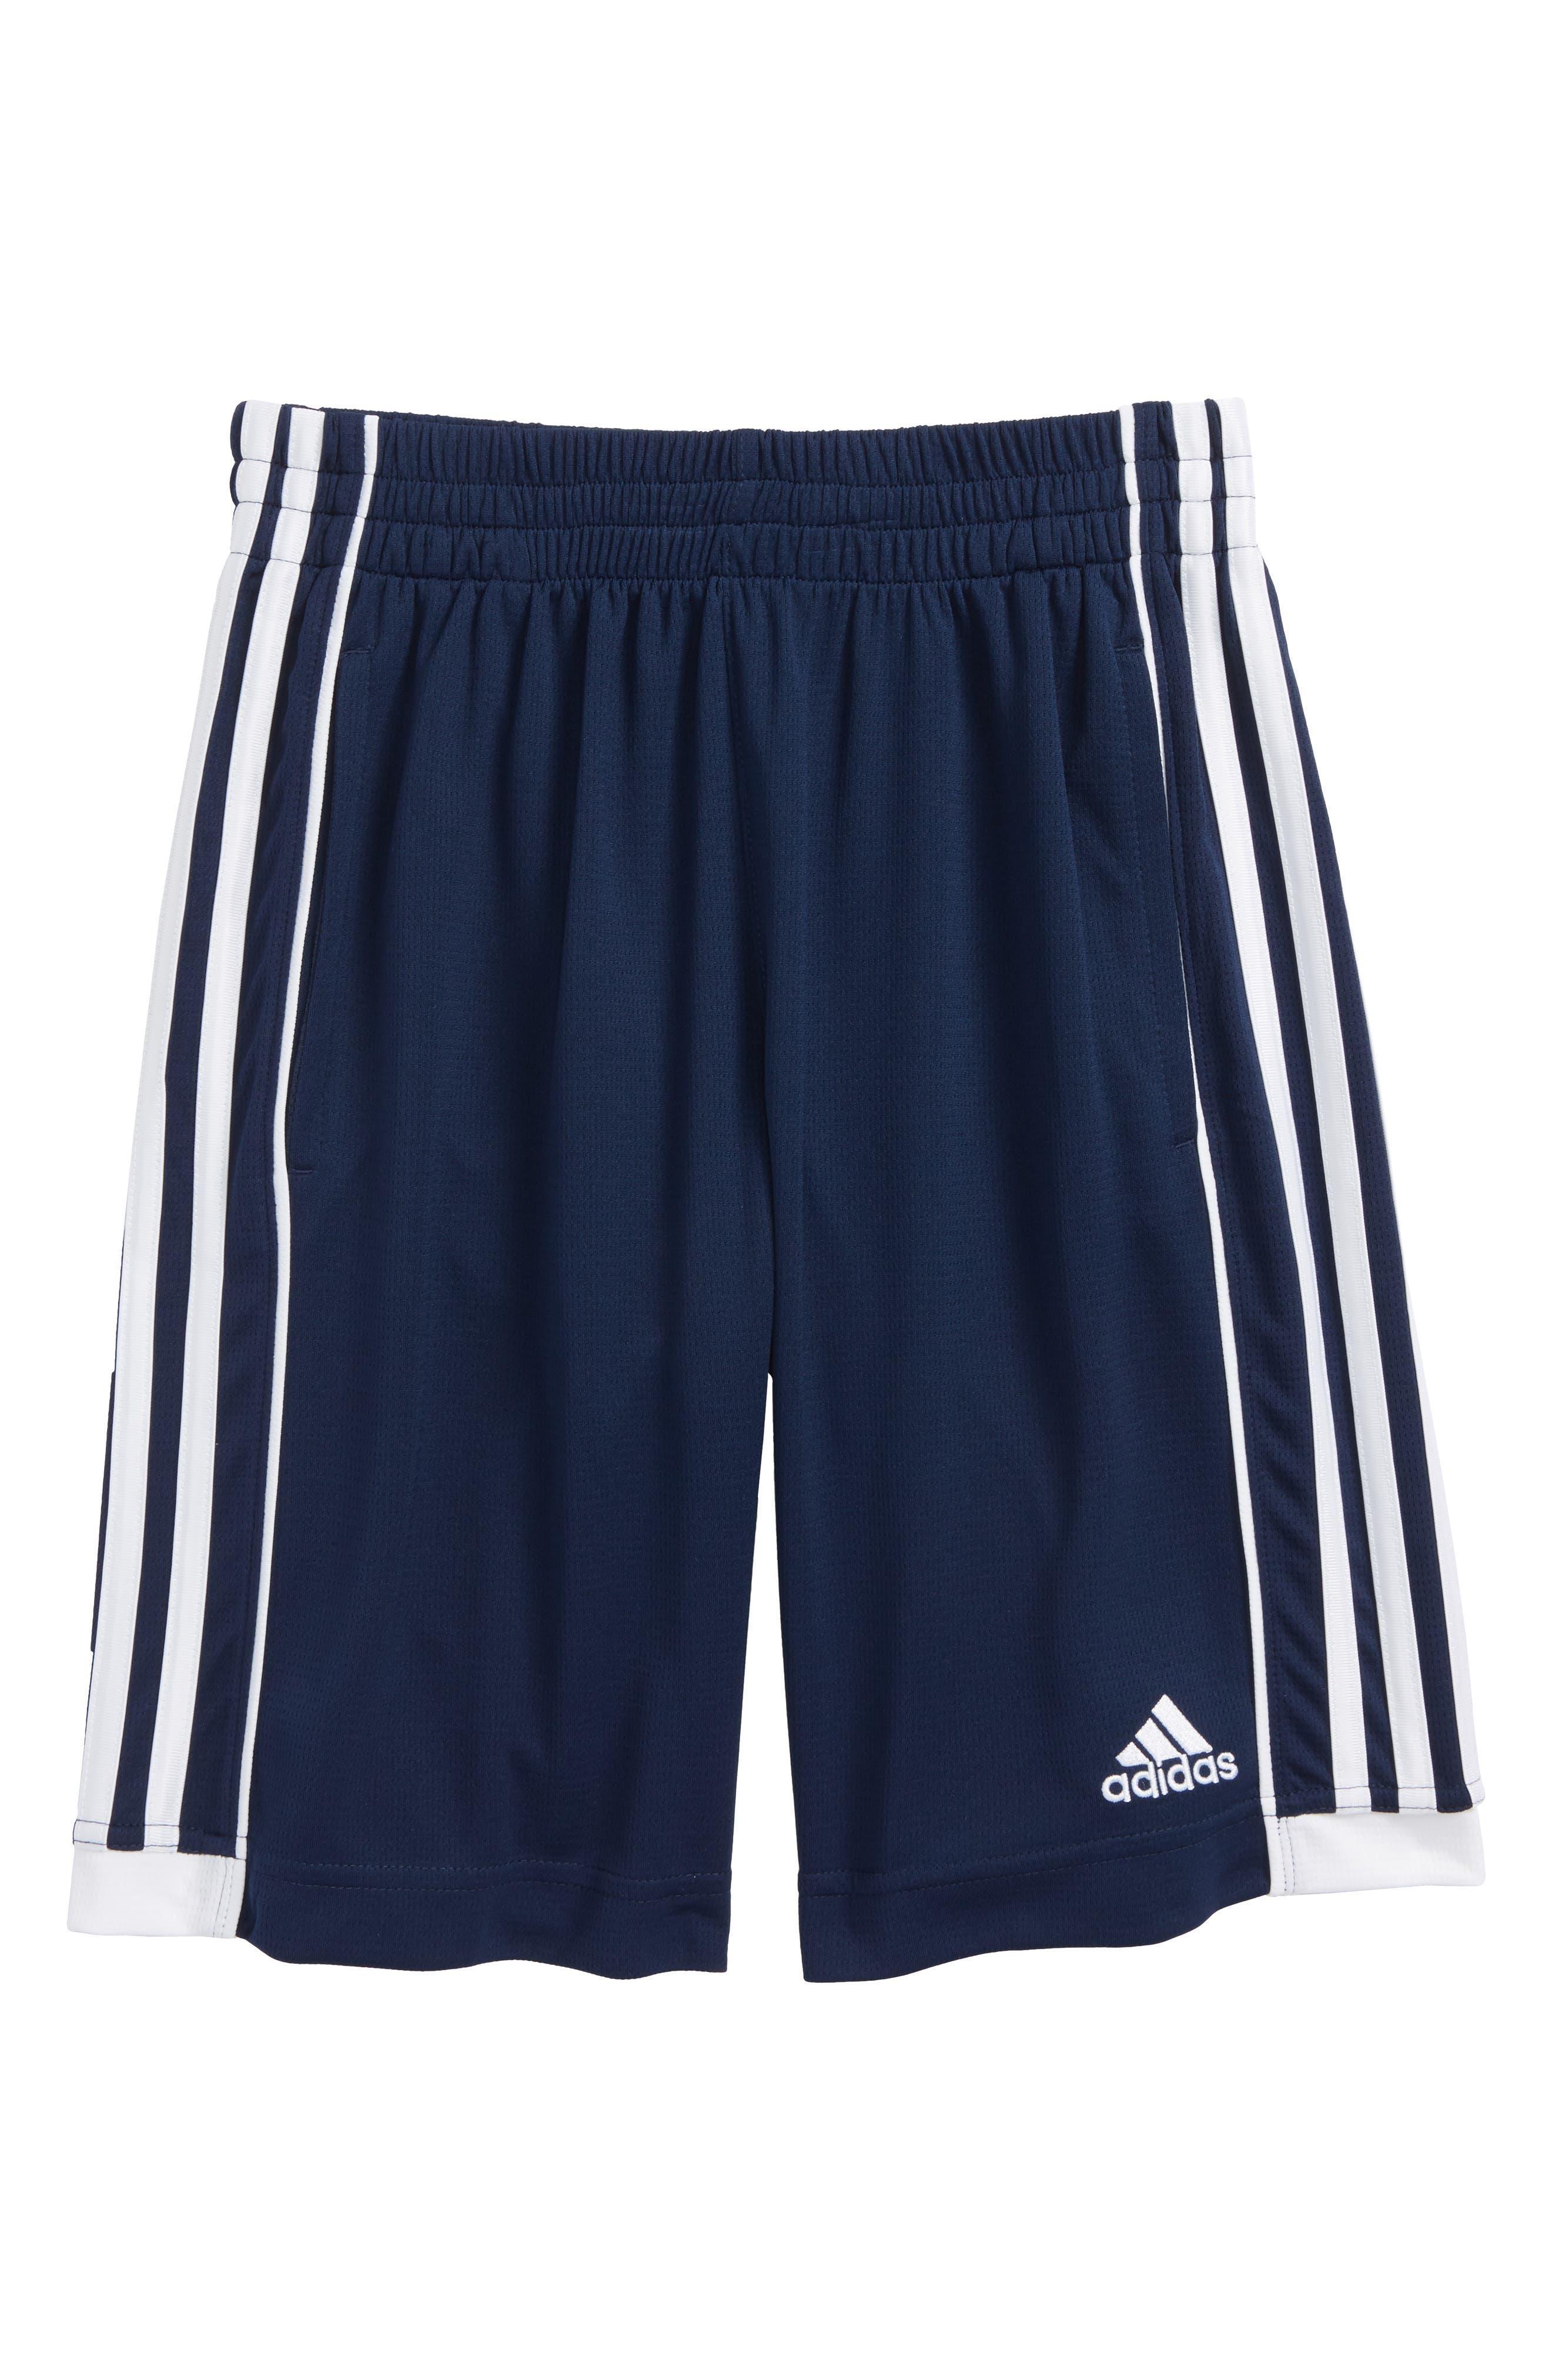 Replenishment Speed Shorts,                         Main,                         color, 412